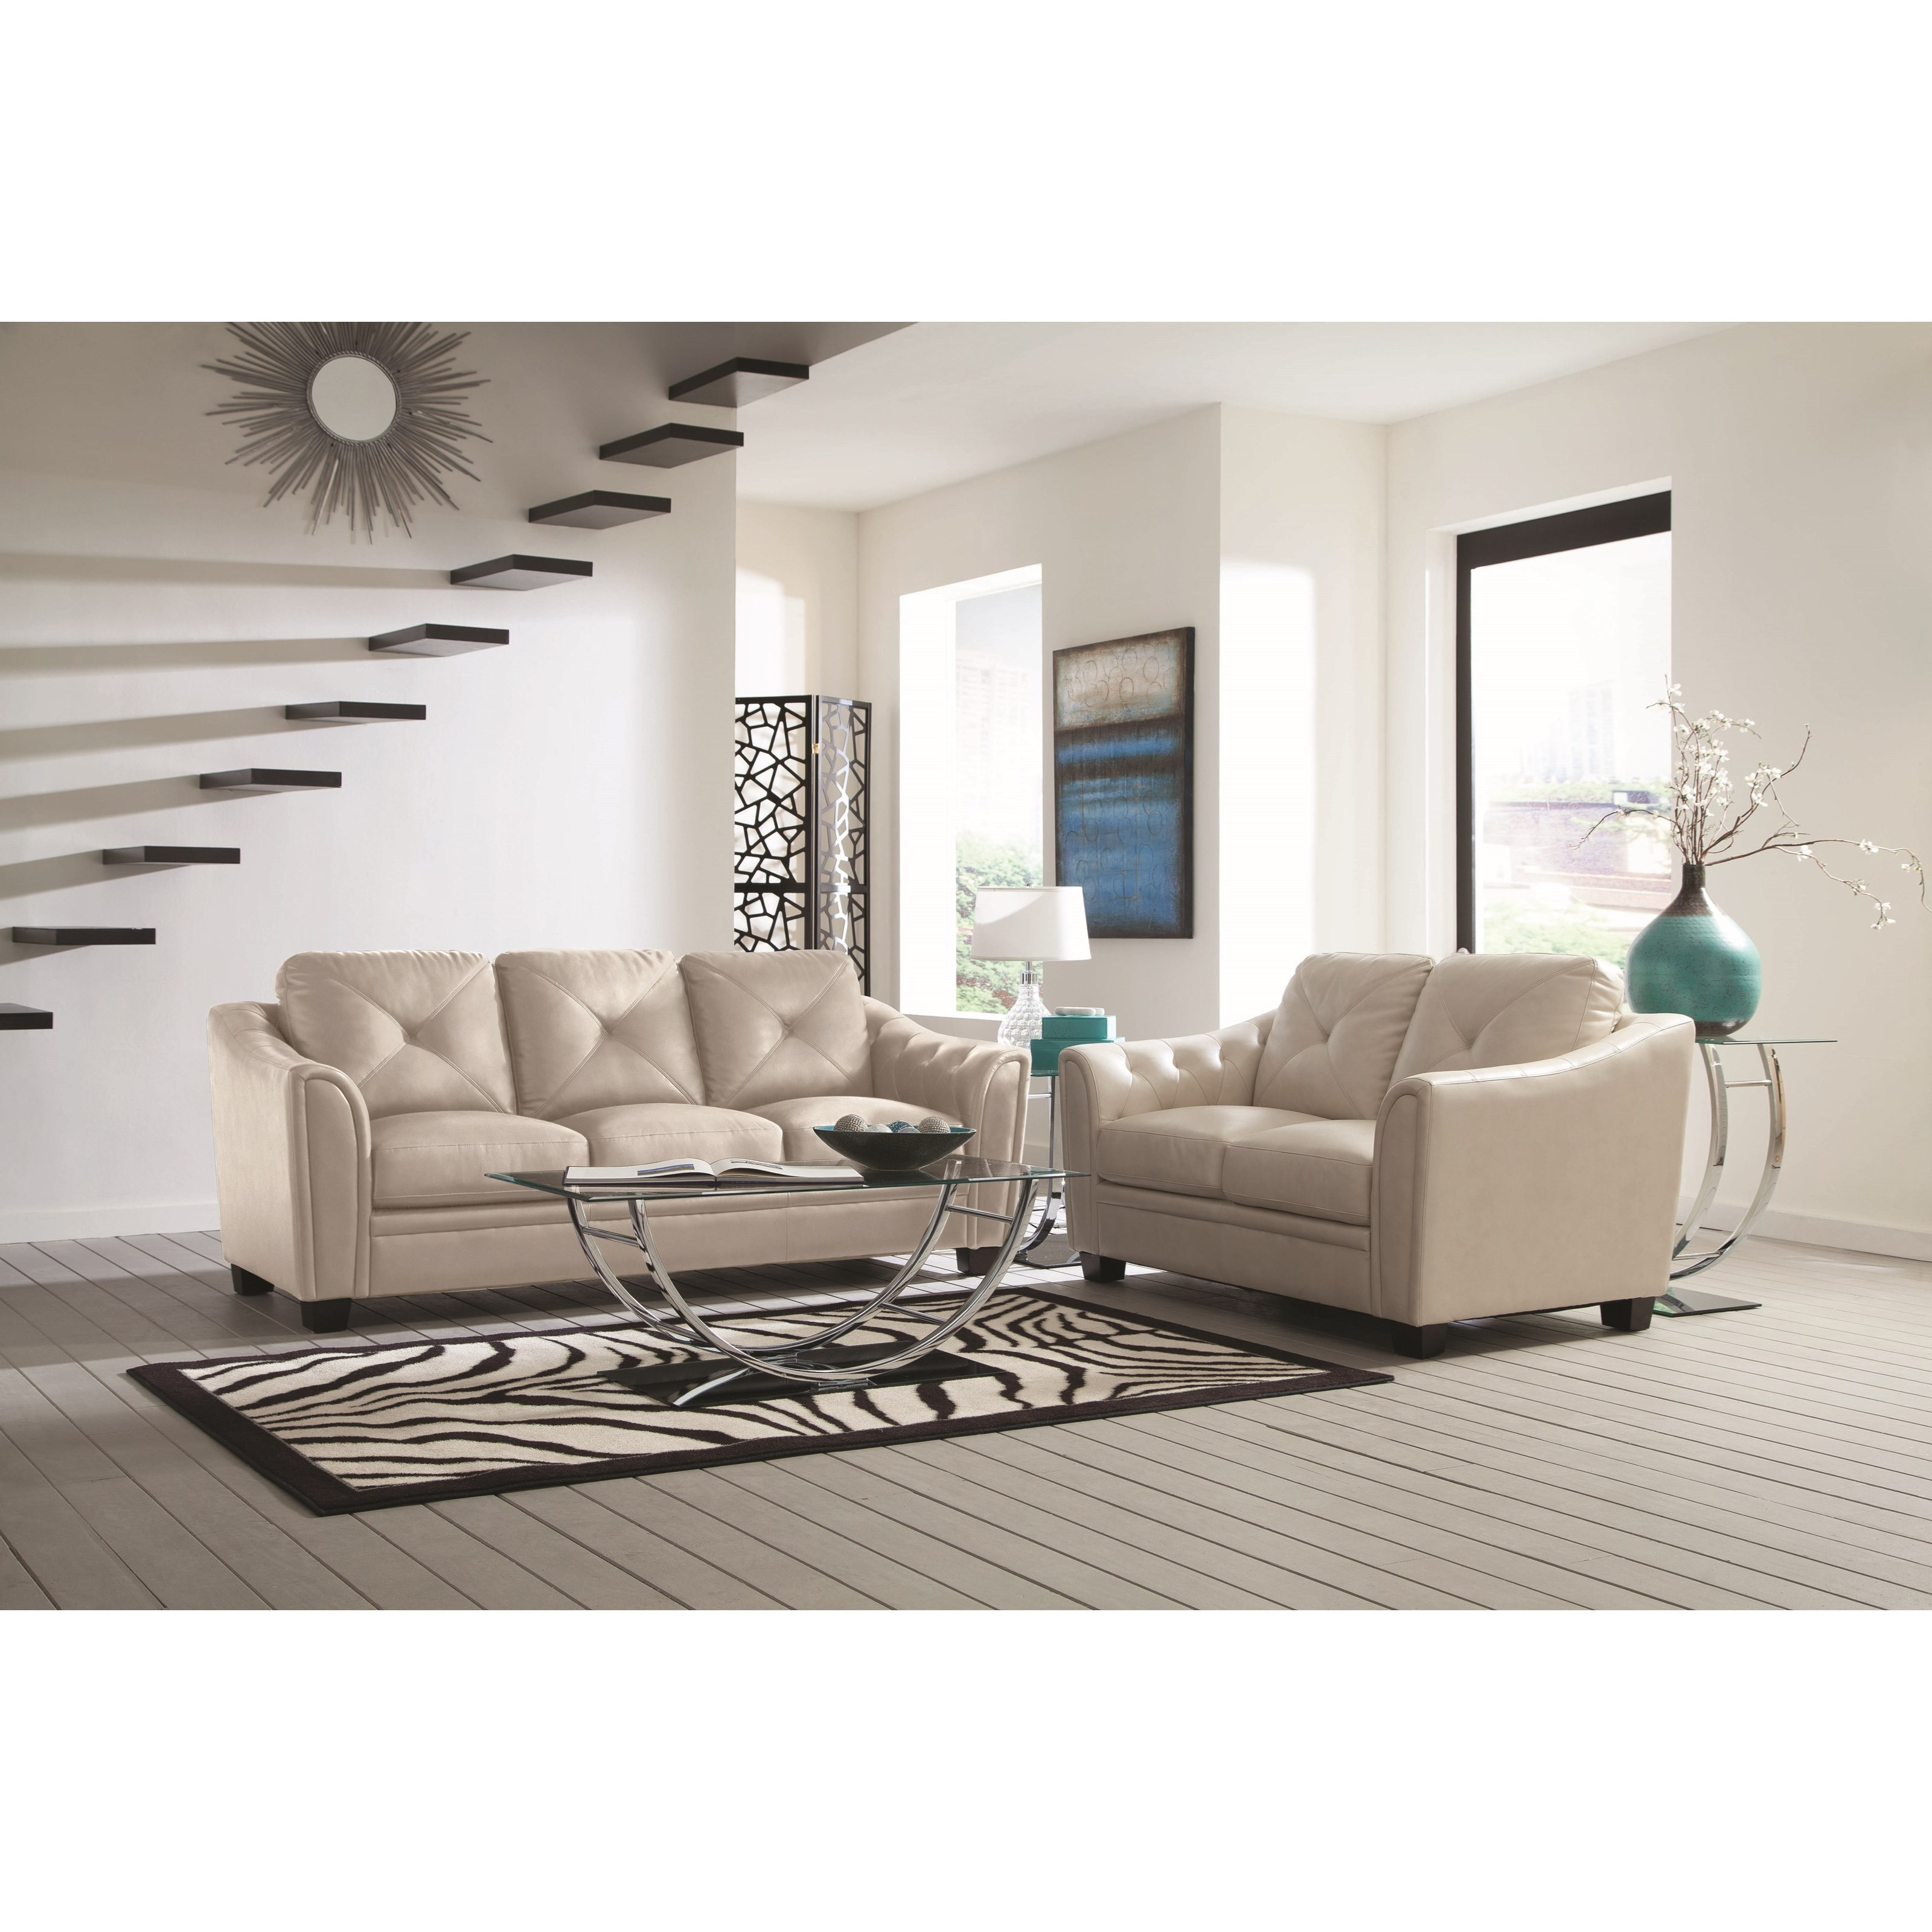 Coaster Avison Living Room Group - Item Number: 505300 Living Room Group 1